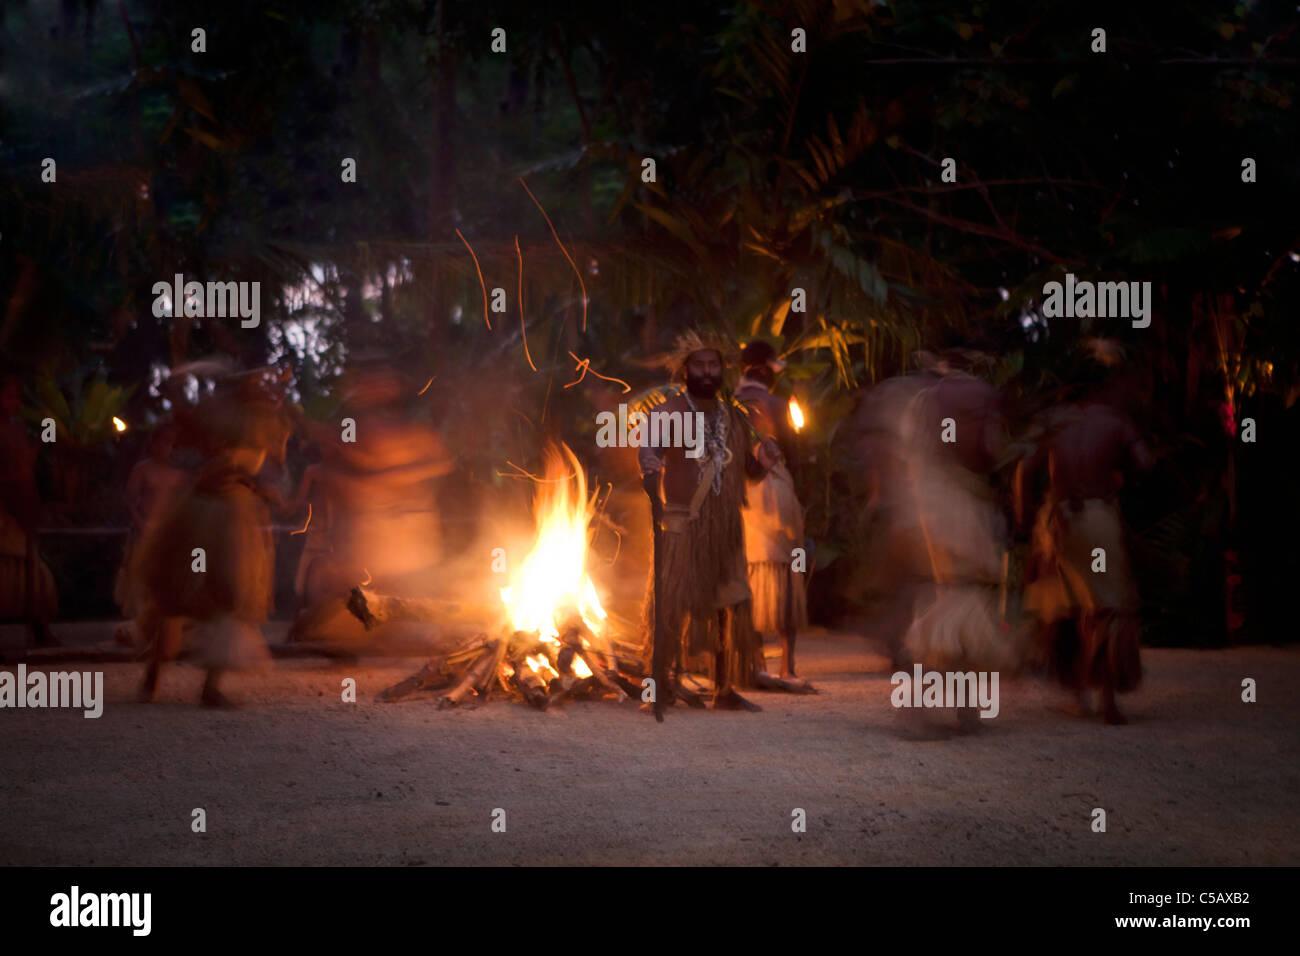 Local ceremonies performed by the indigenous people of Vanuatu - Stock Image